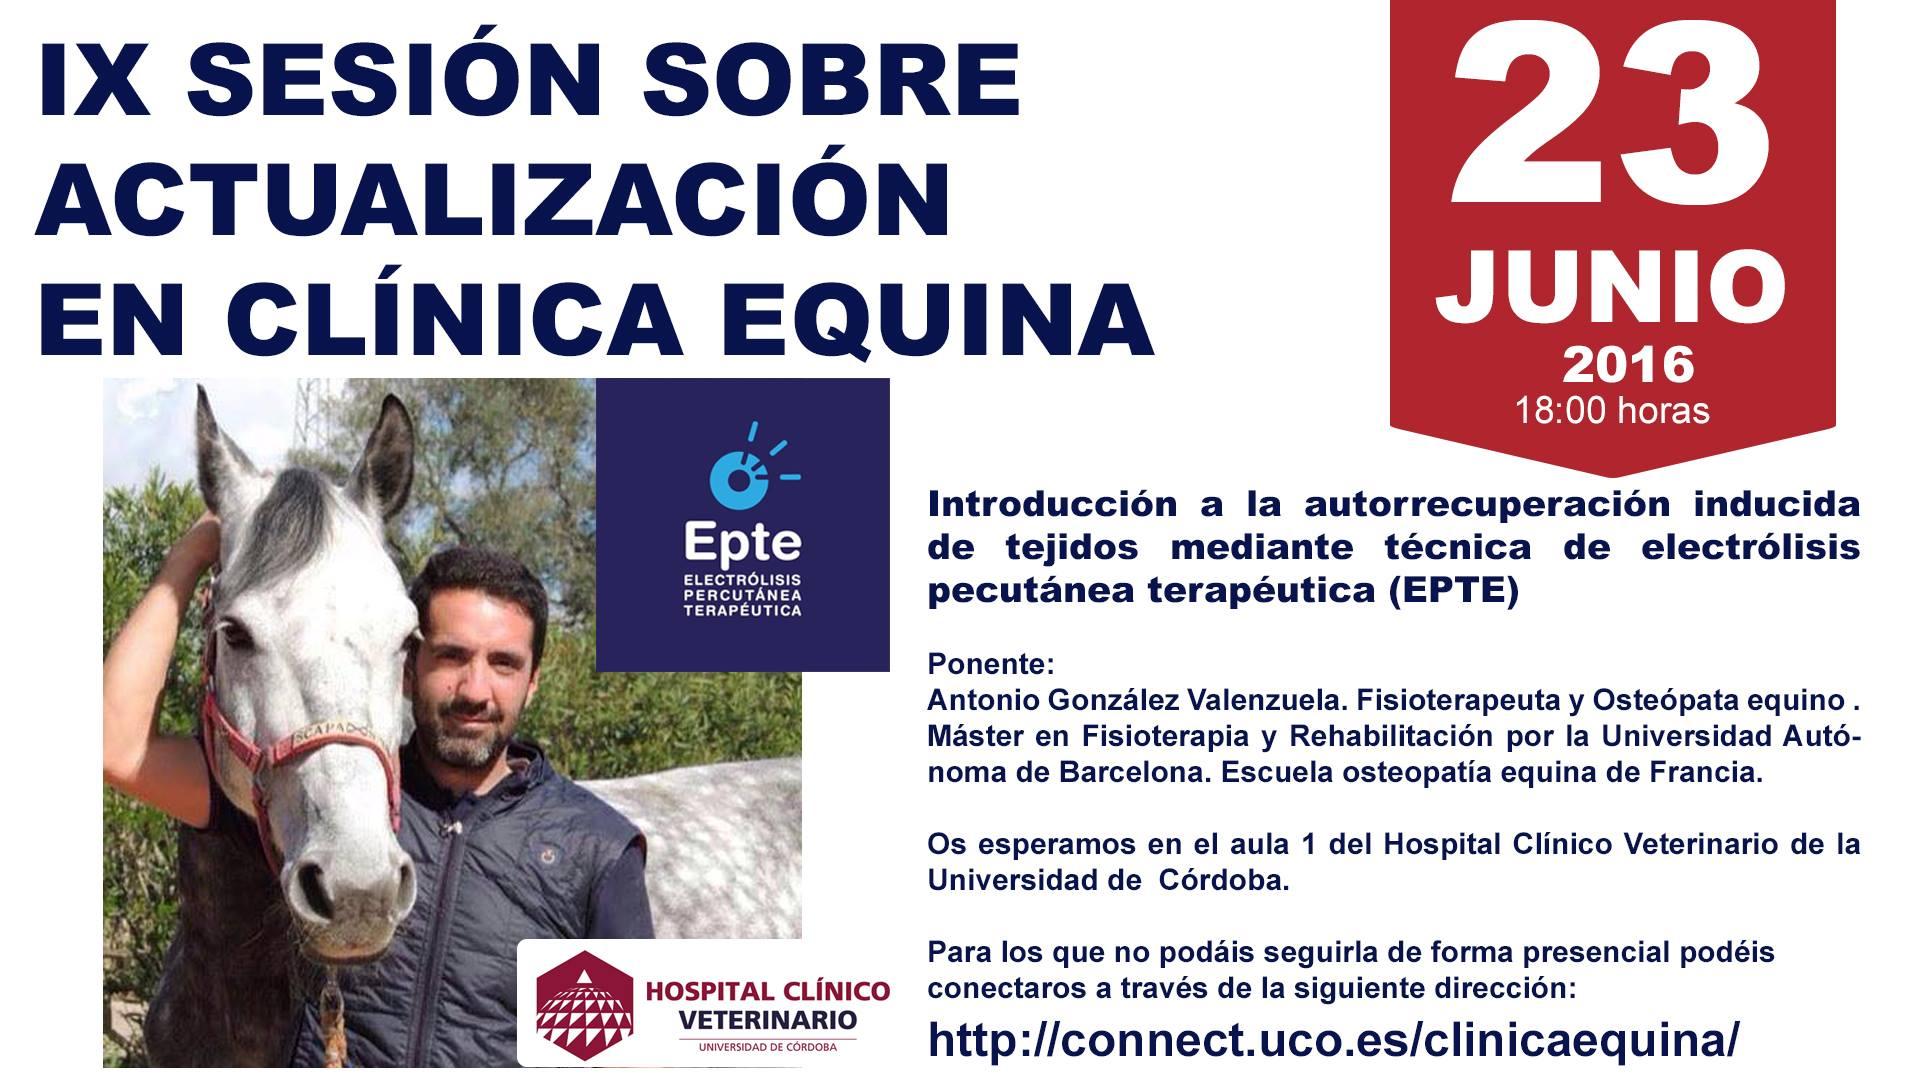 IX_sesion_sobre_actualizacion_en_clinica_equina_23_junio_2016